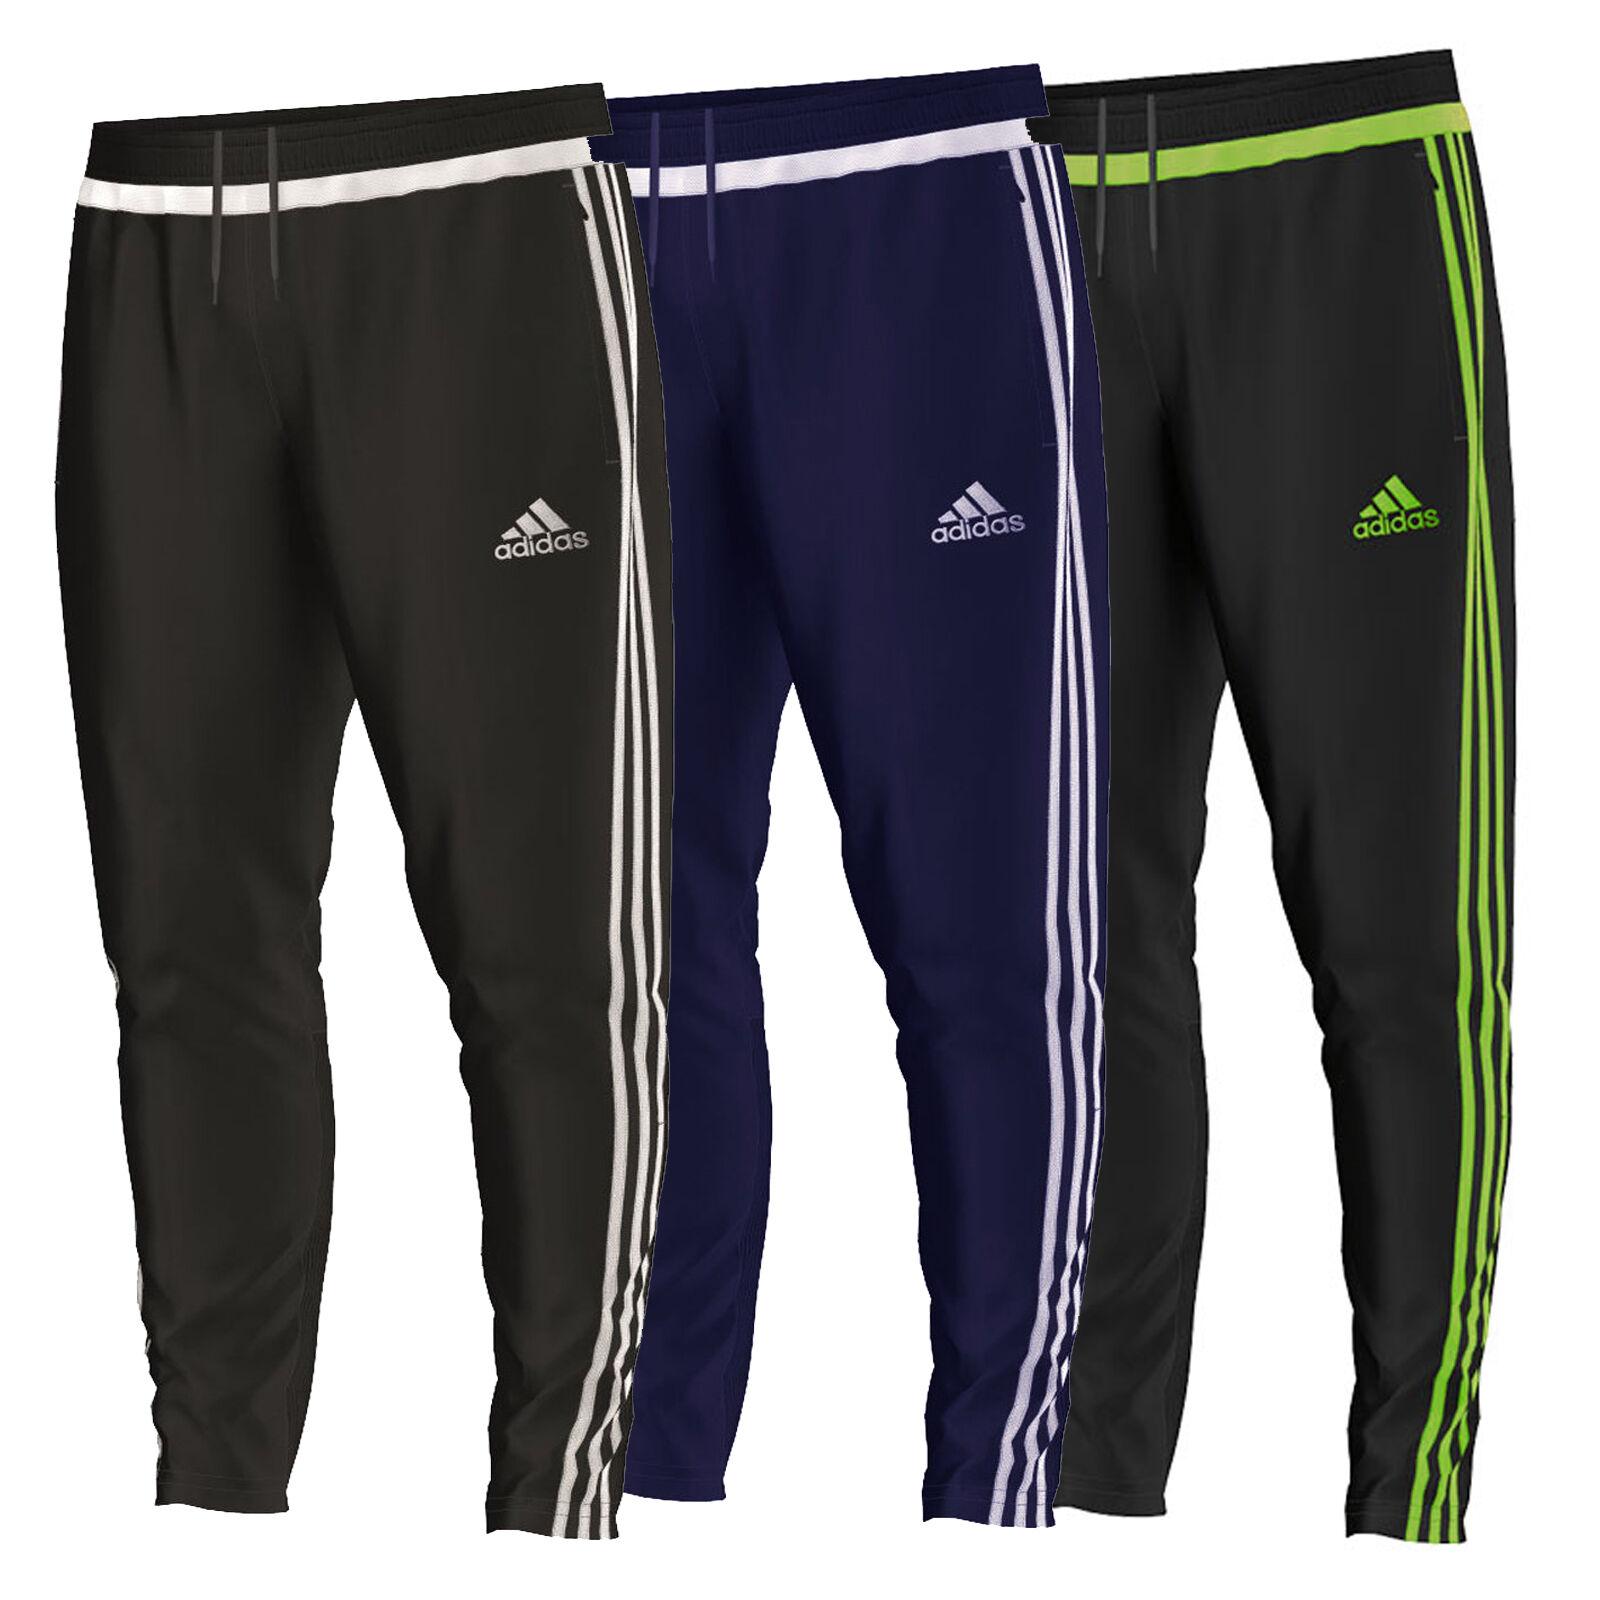 adidas Tiro 17 Pants - Men's Metallic $ $ adidas Iconic Tricot Pants - Boys' Grade School $ $ adidas Originals Adicolor Superstar Track Pants - Boys' Grade School $ $